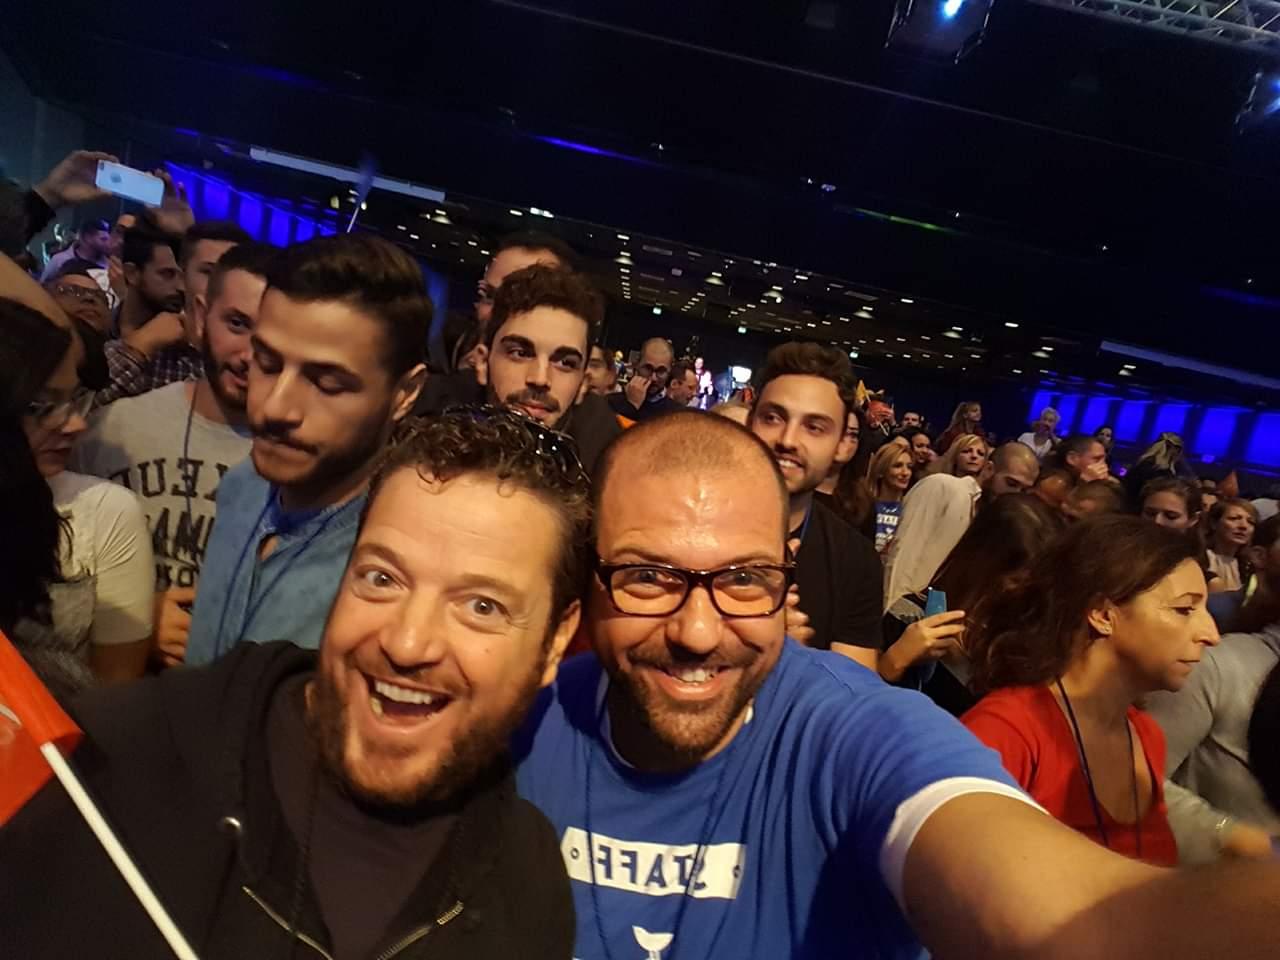 Duolife_2019_corrado_cavarra_networker_sicilia_italia12